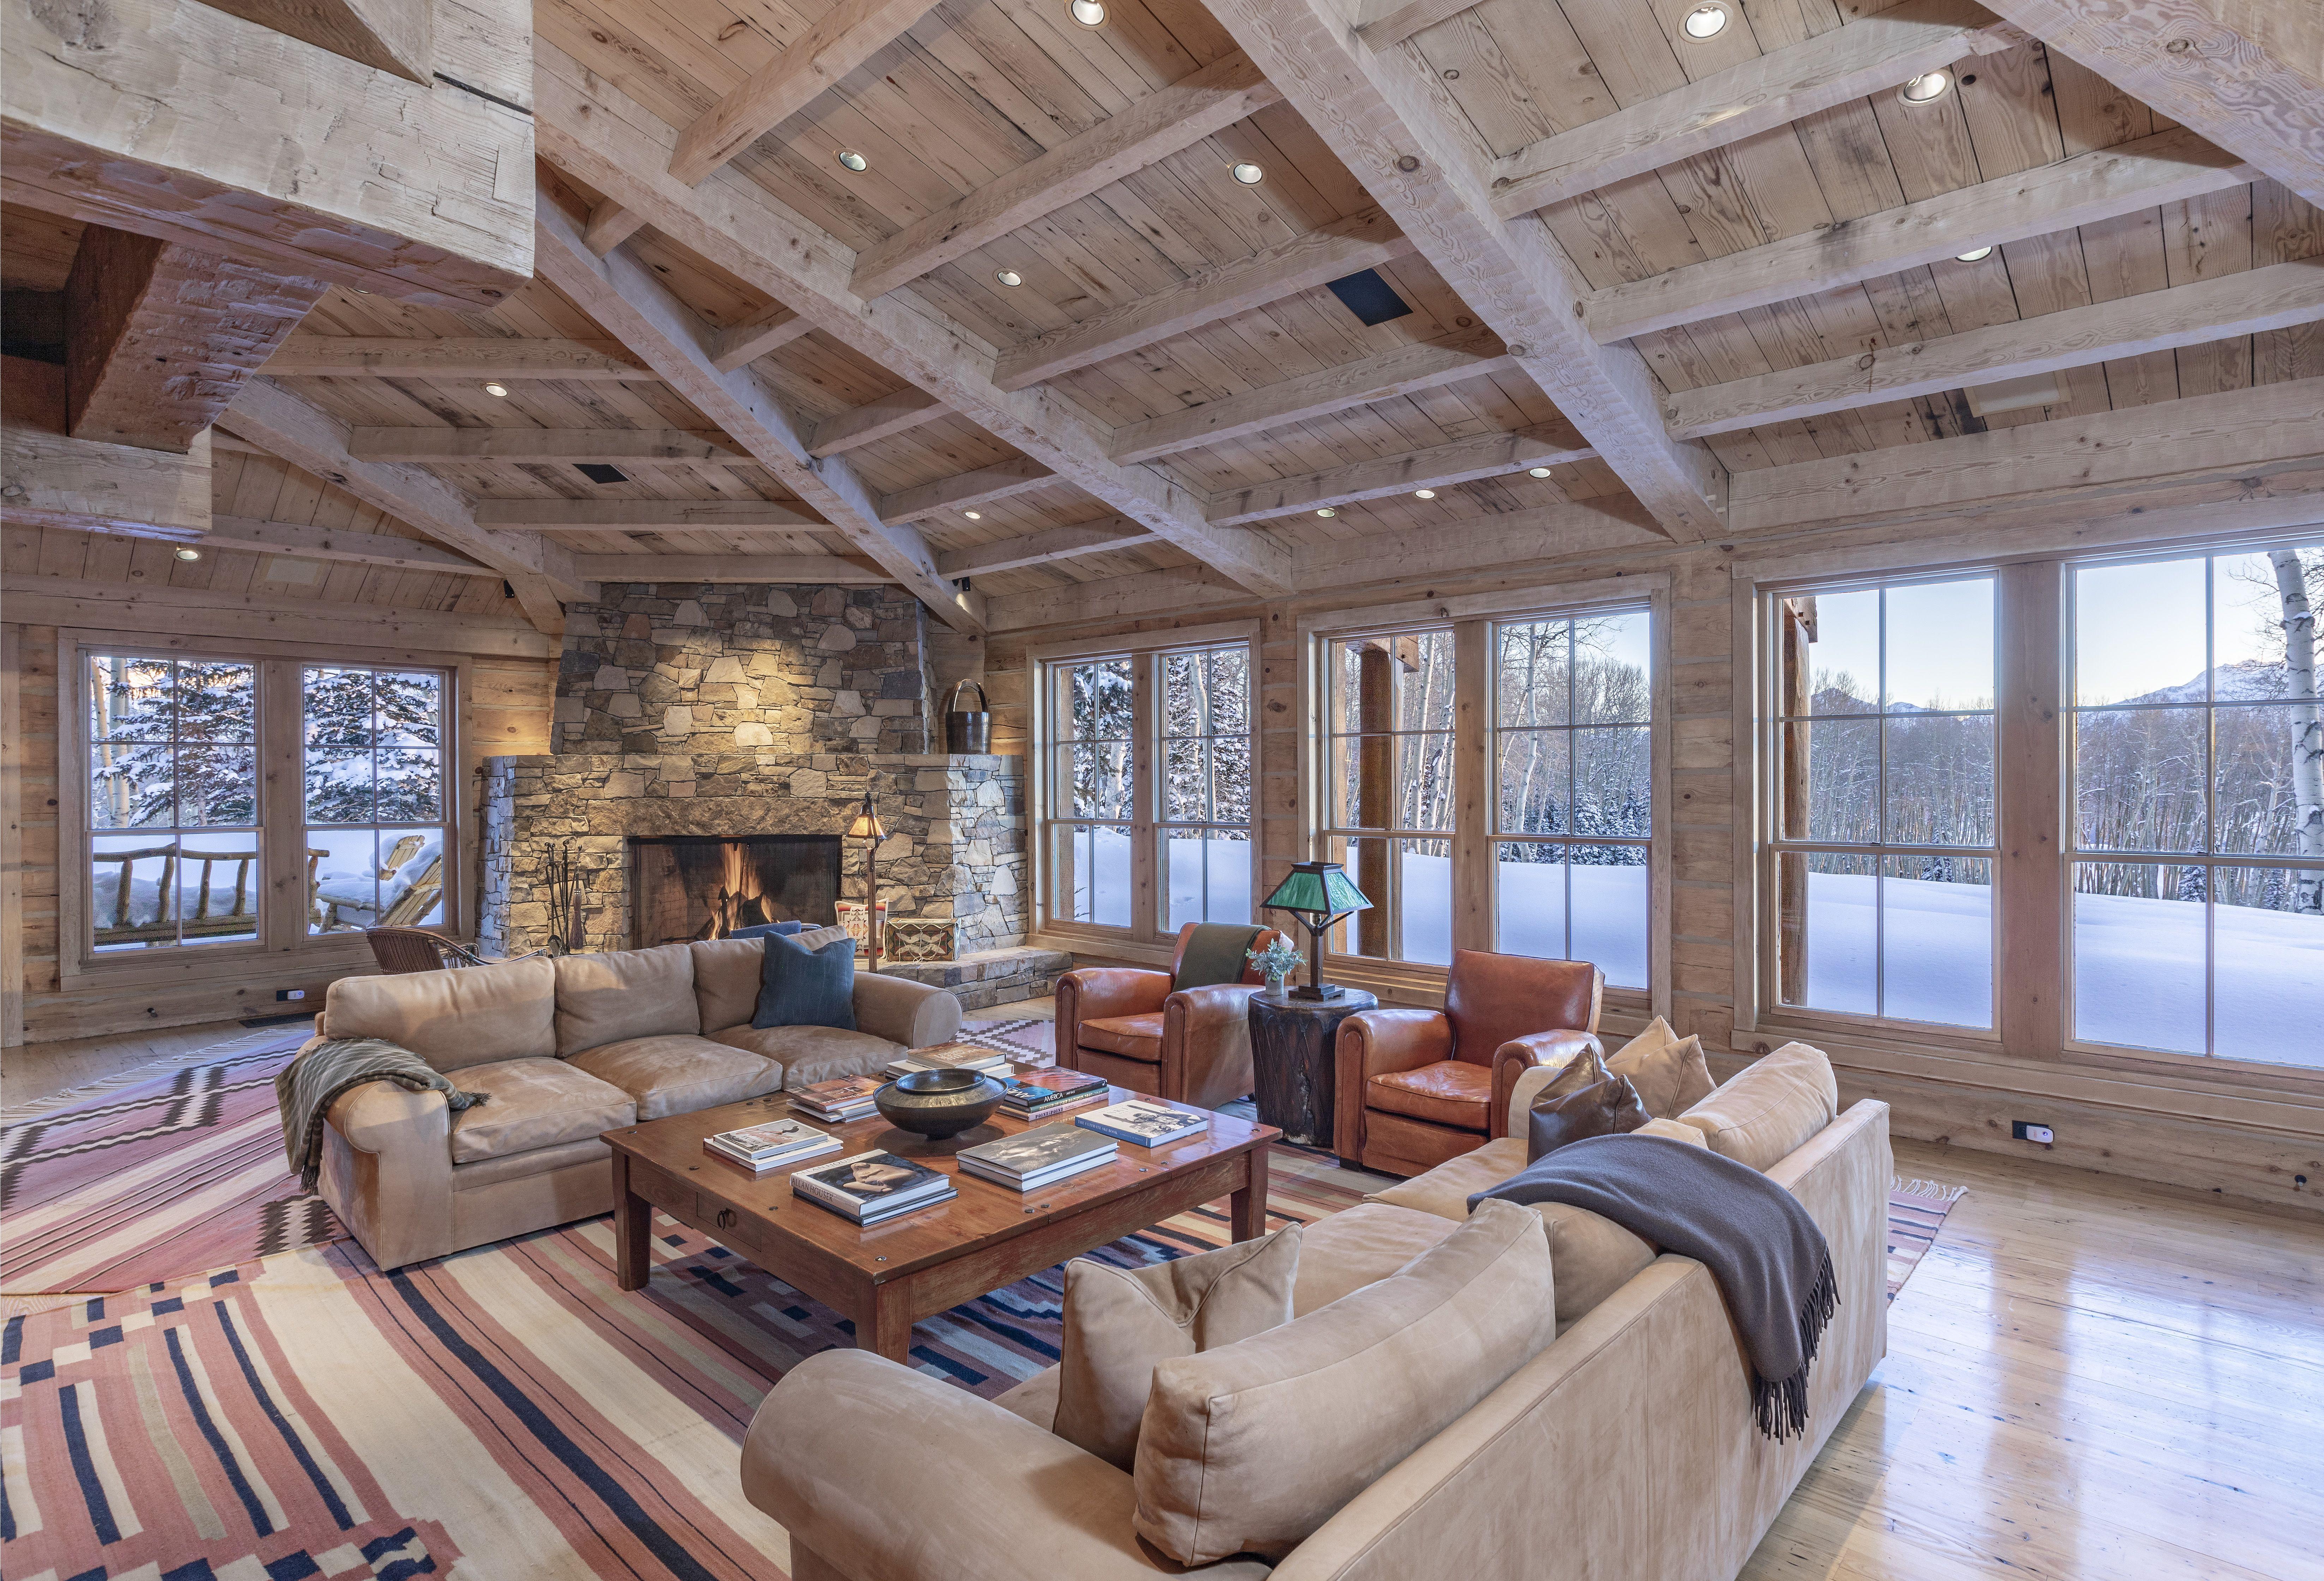 Tom Cruise's Telluride Ranch living room